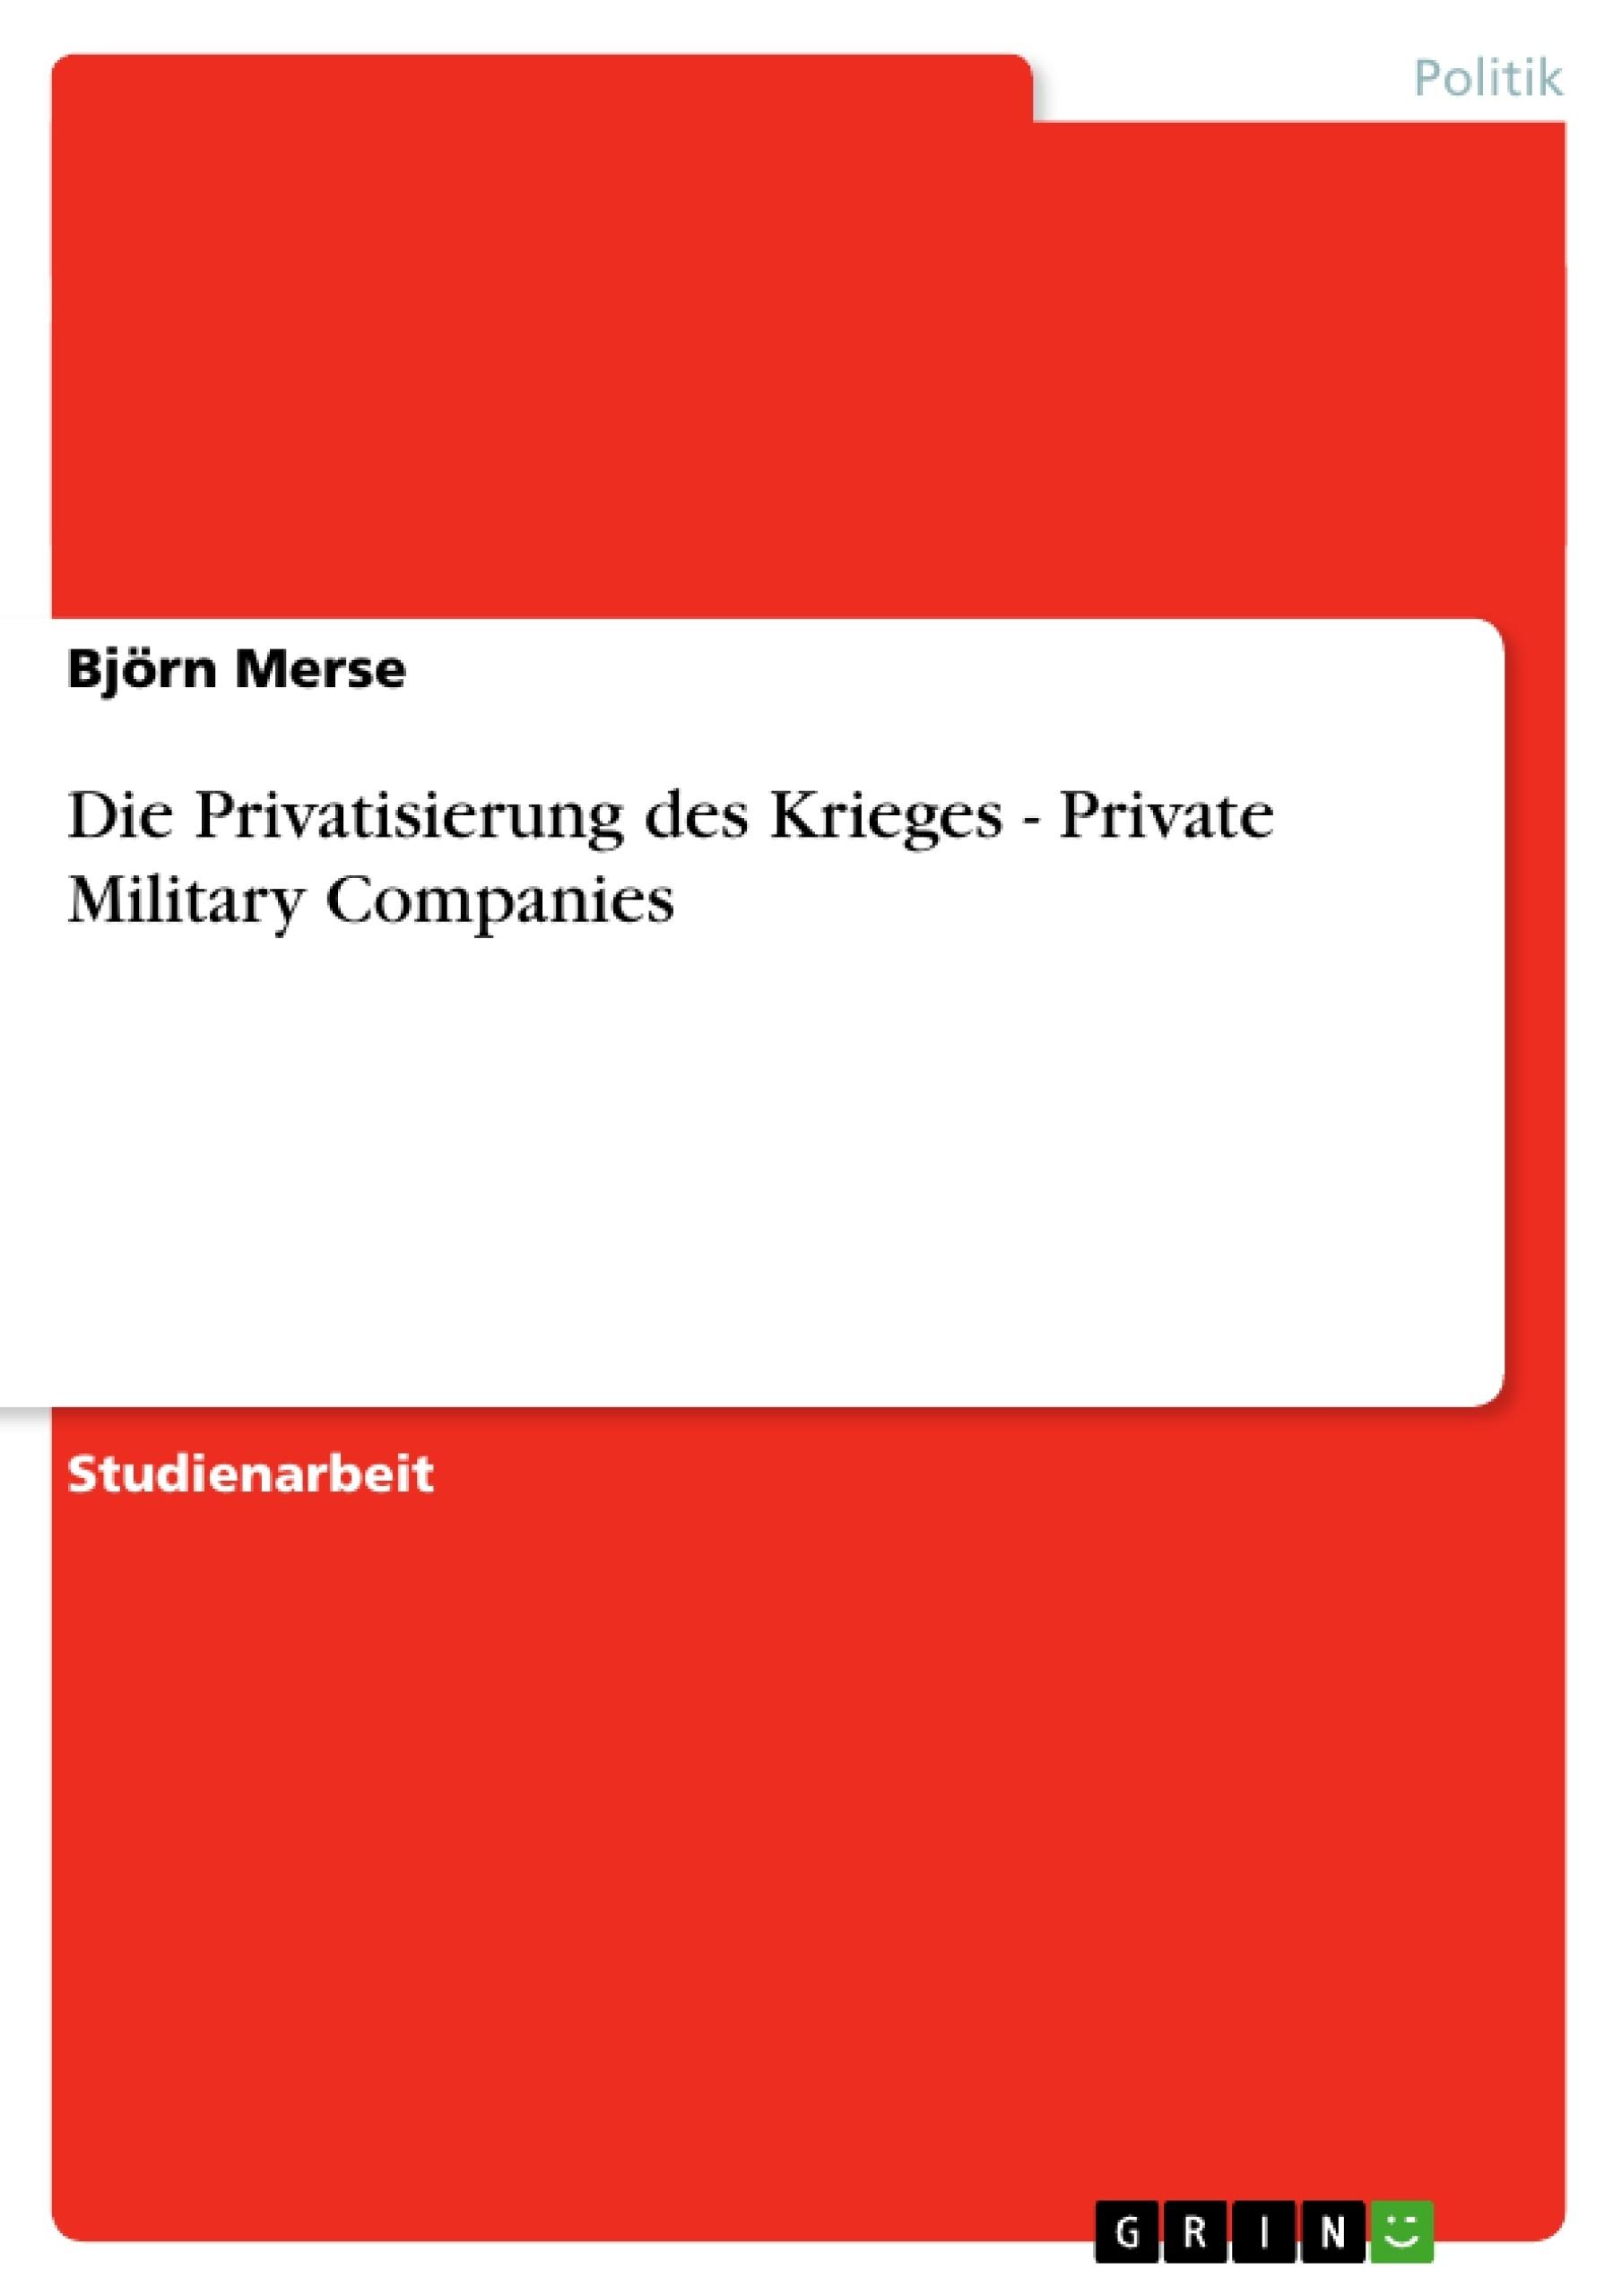 Titel: Die Privatisierung des Krieges - Private Military Companies